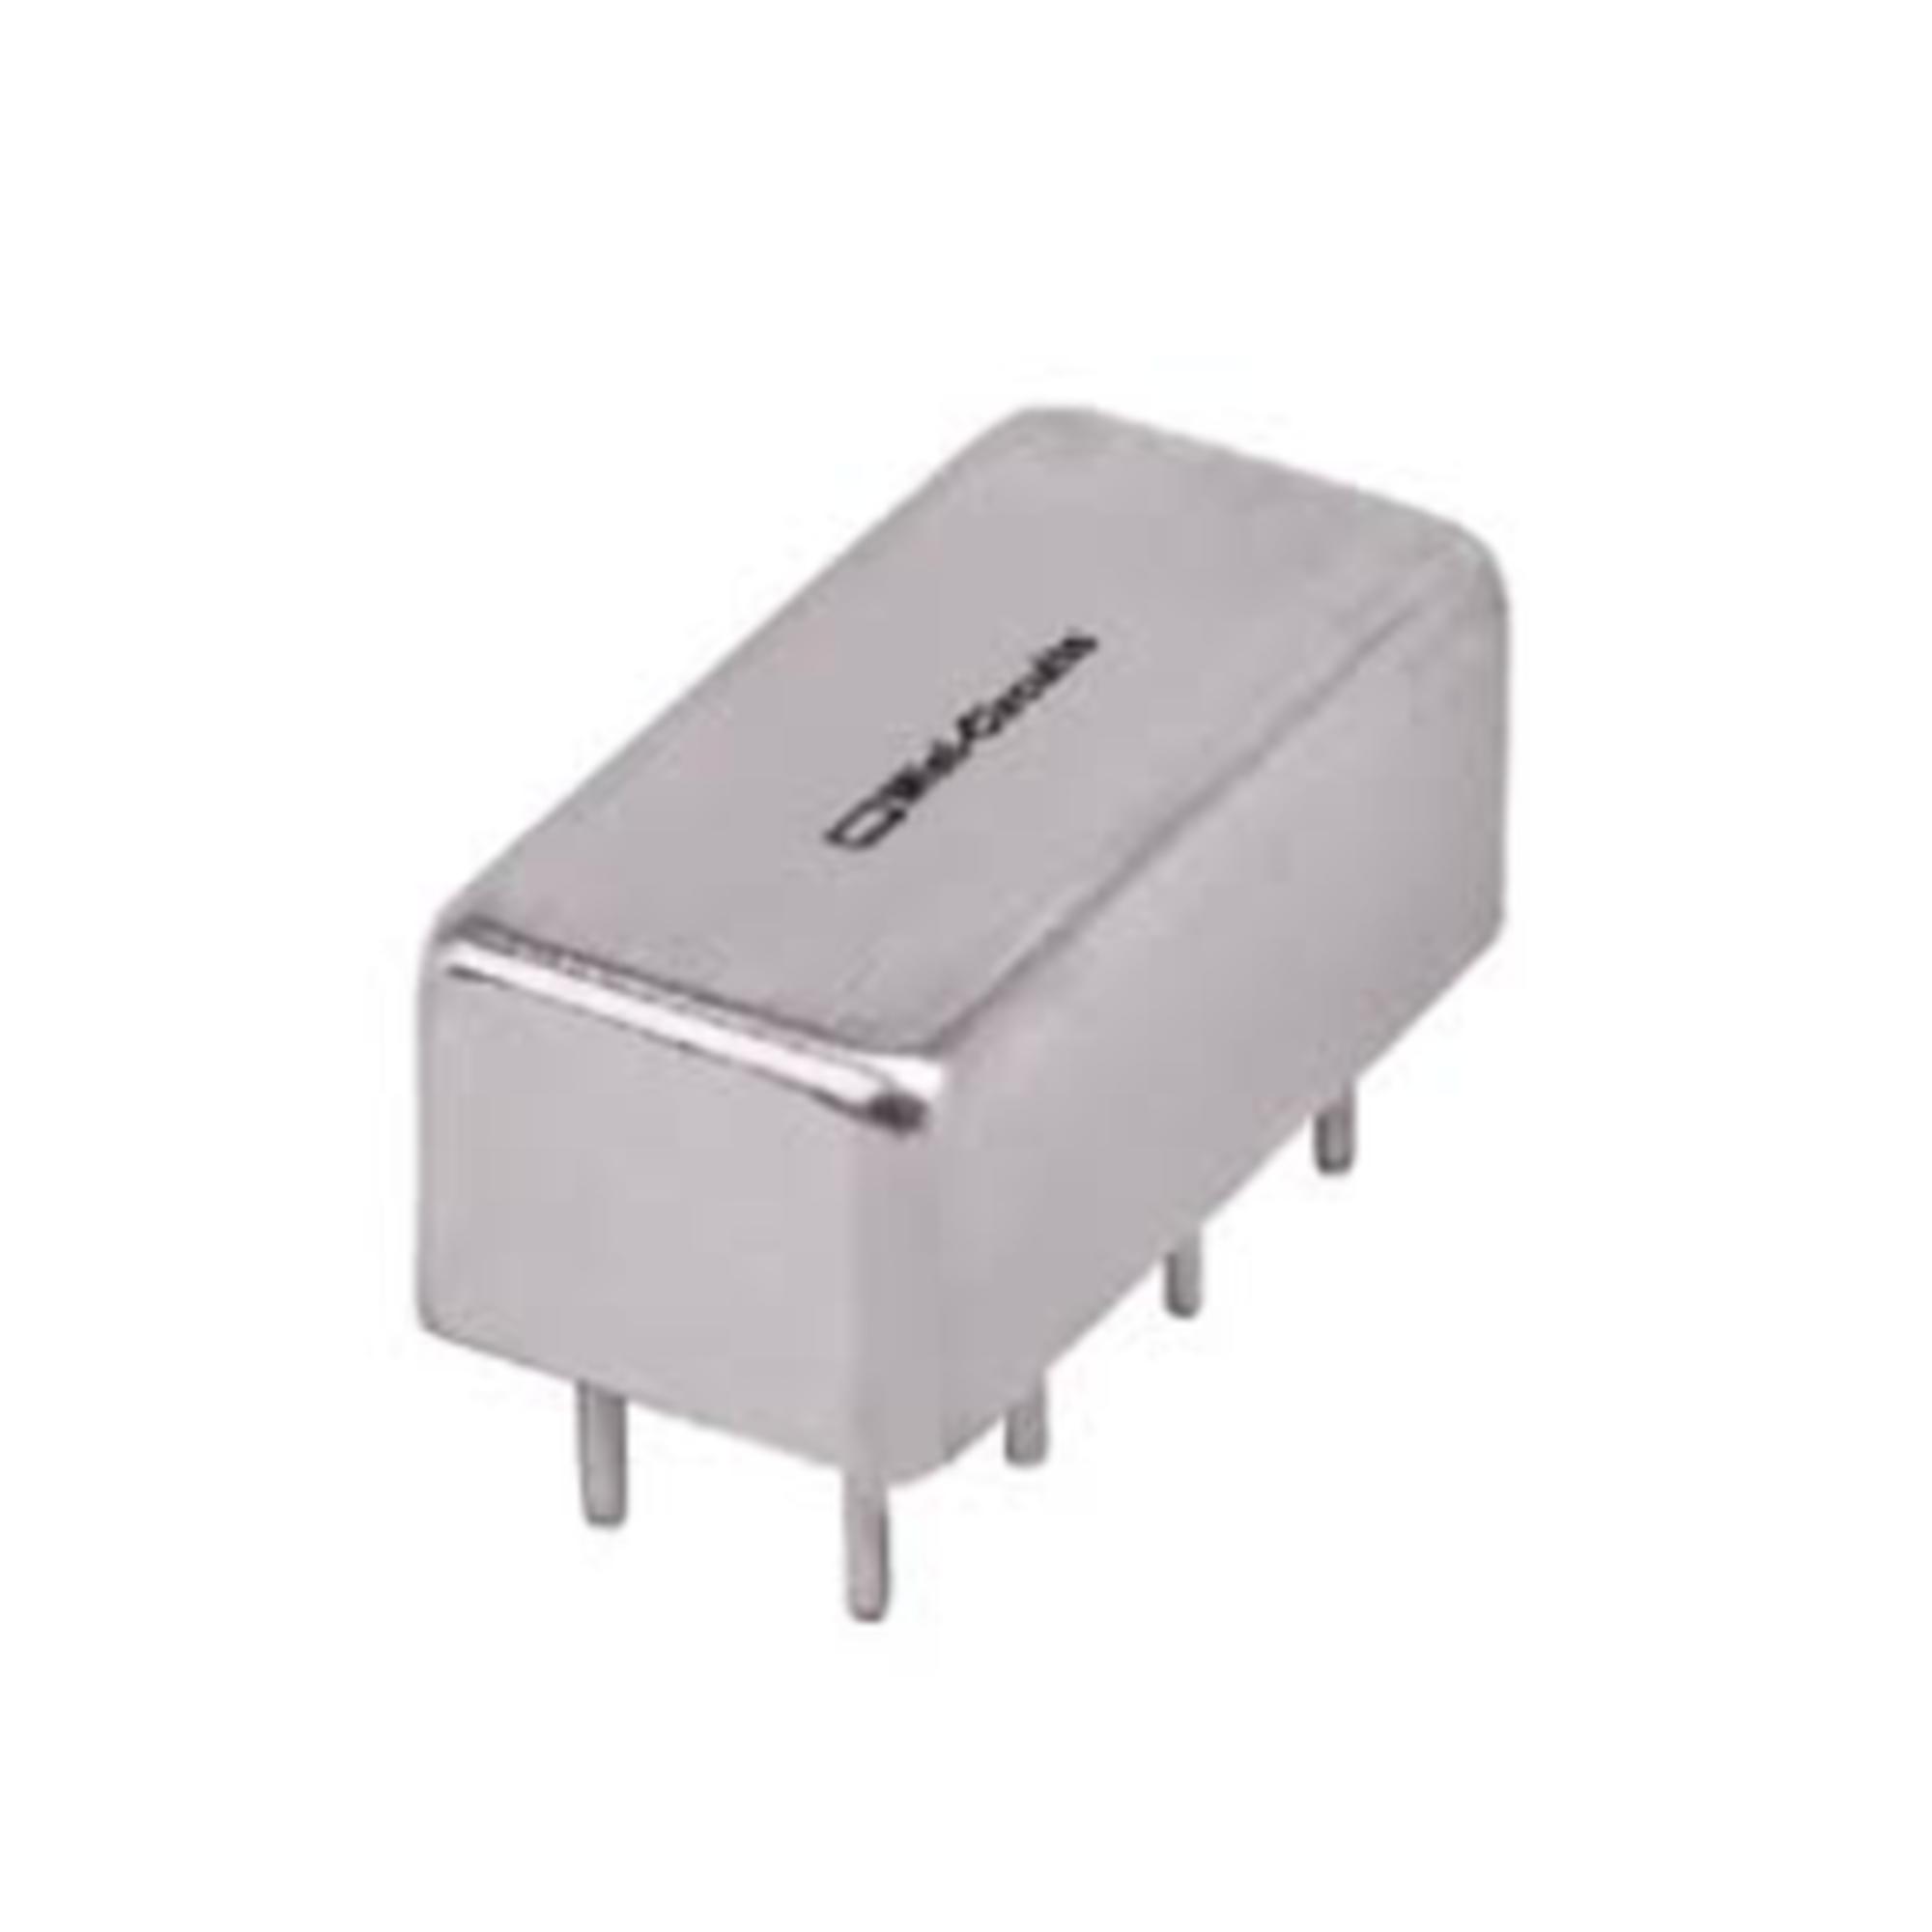 Mezclador de Frecuencia (MICR15) Cristal para COM-3, 10-1000 MHz.